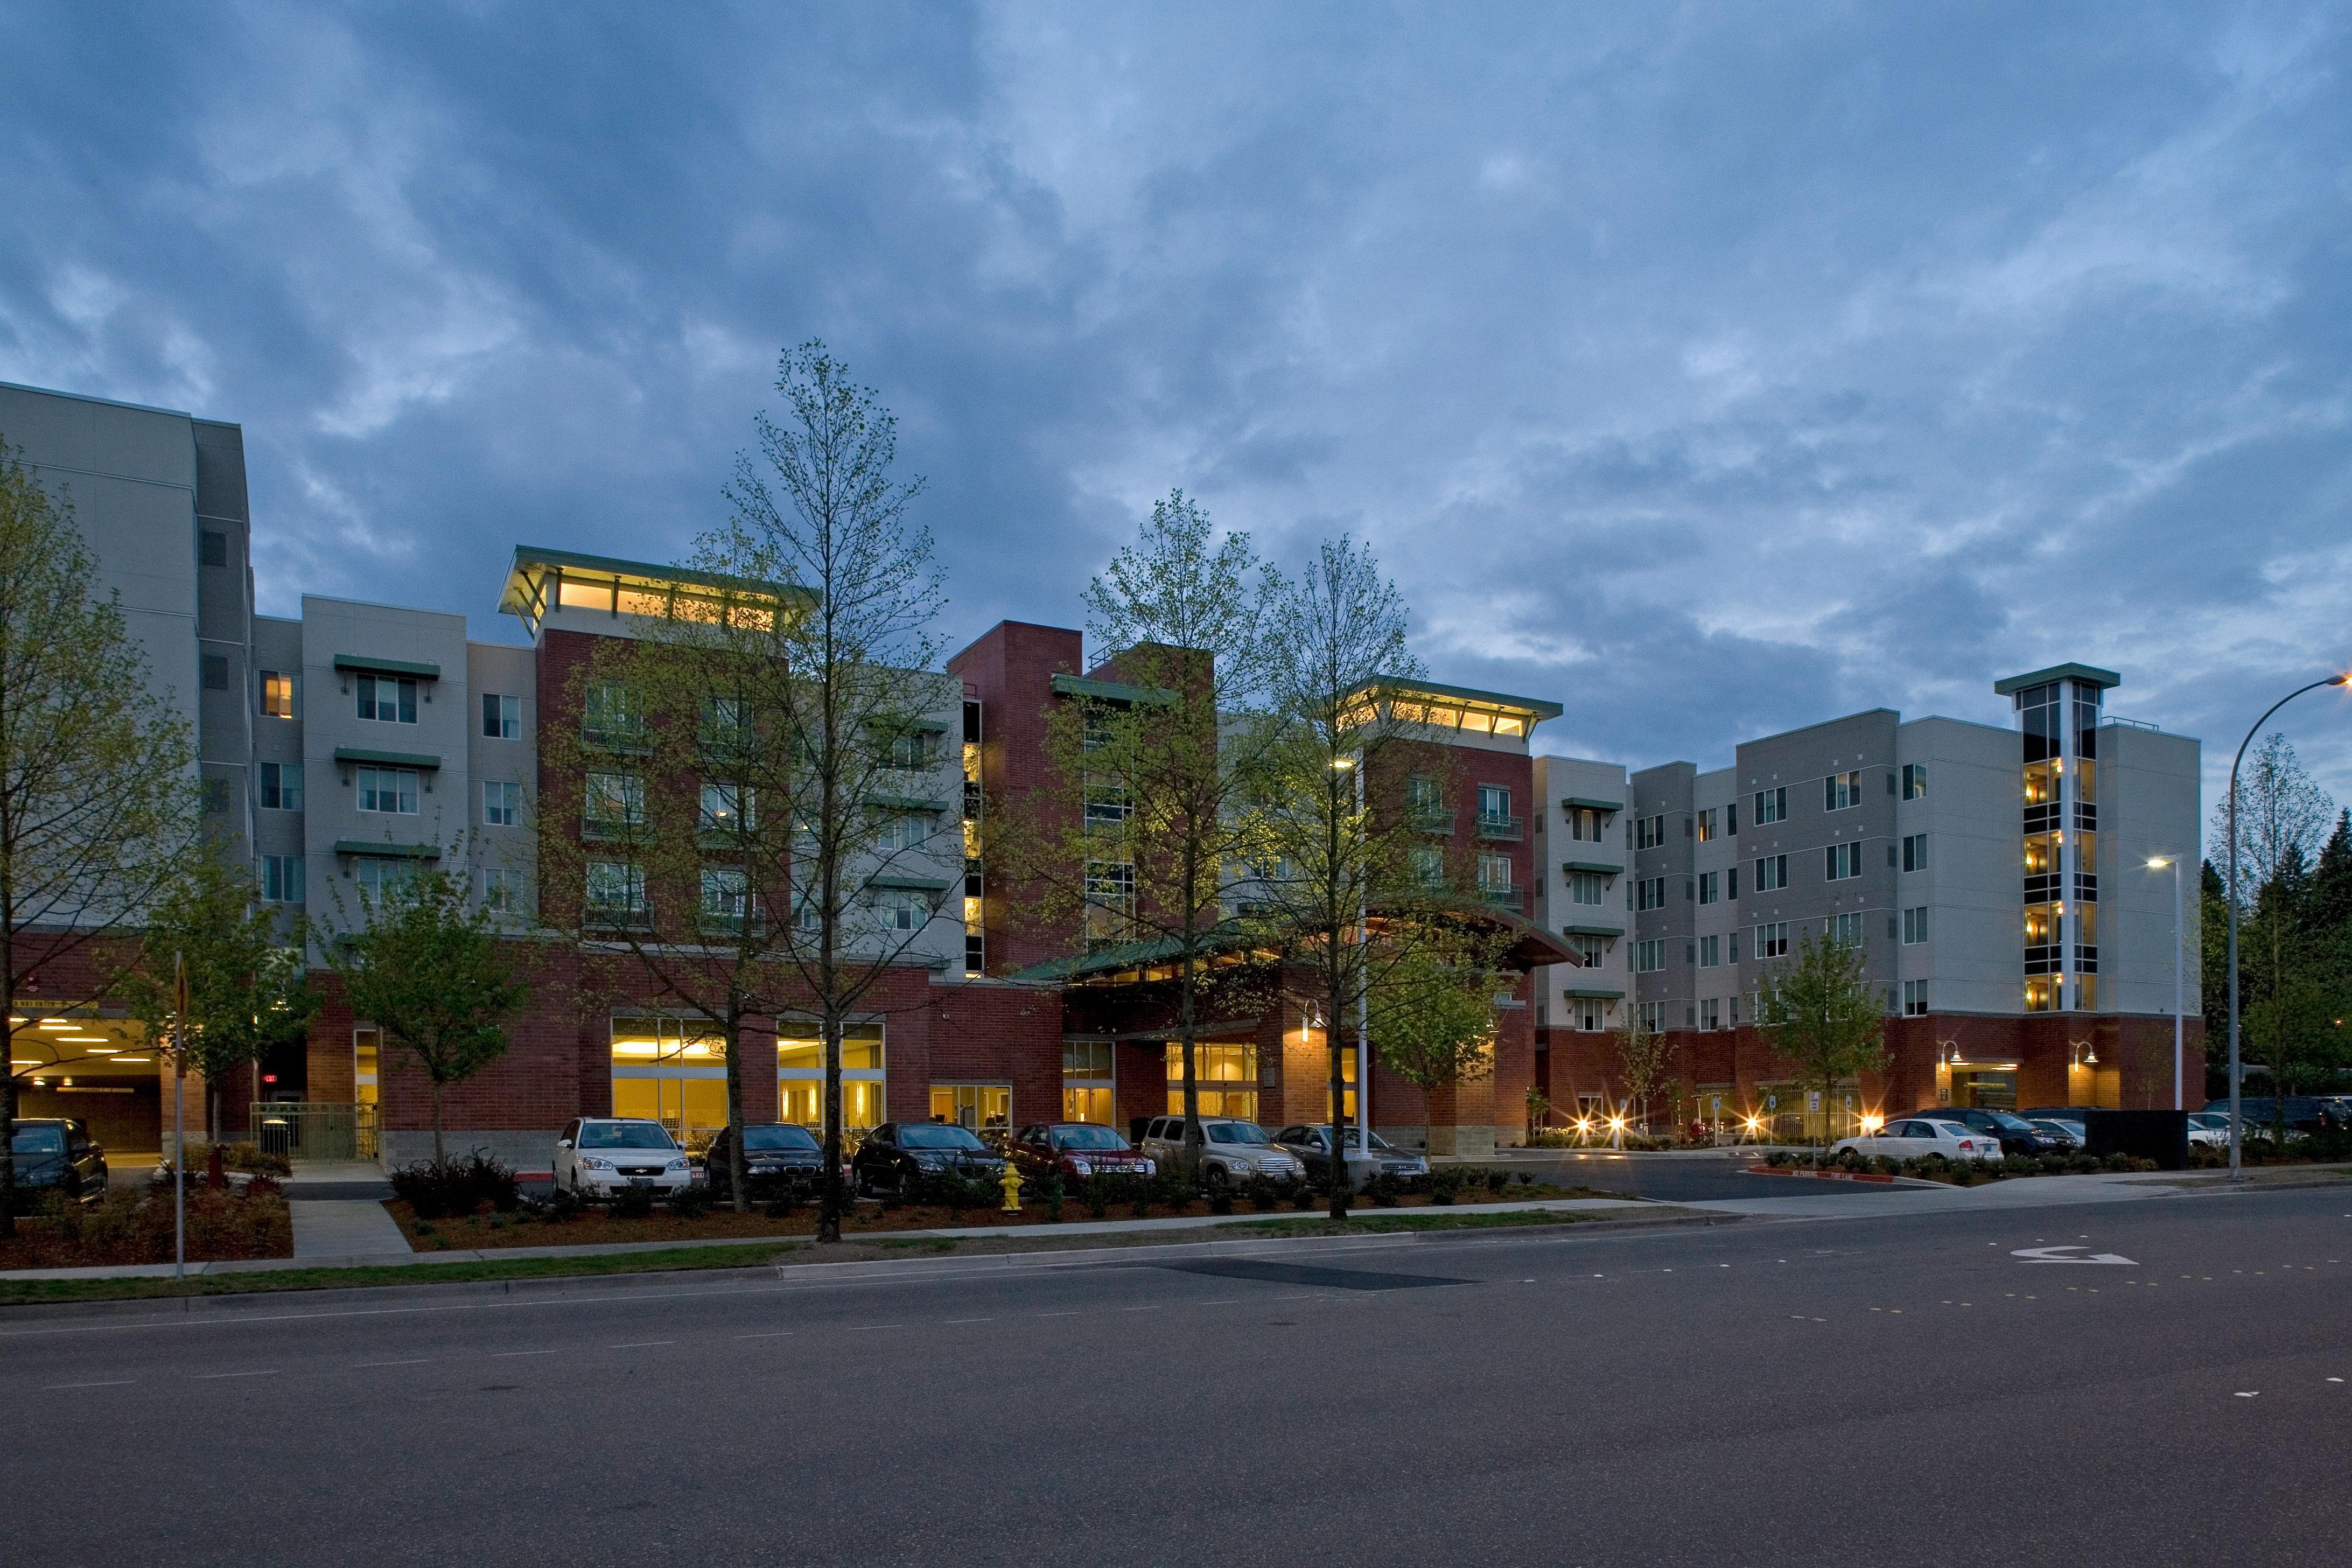 hyatt house seattle bellevue in bellevue wa 425 747 2. Black Bedroom Furniture Sets. Home Design Ideas